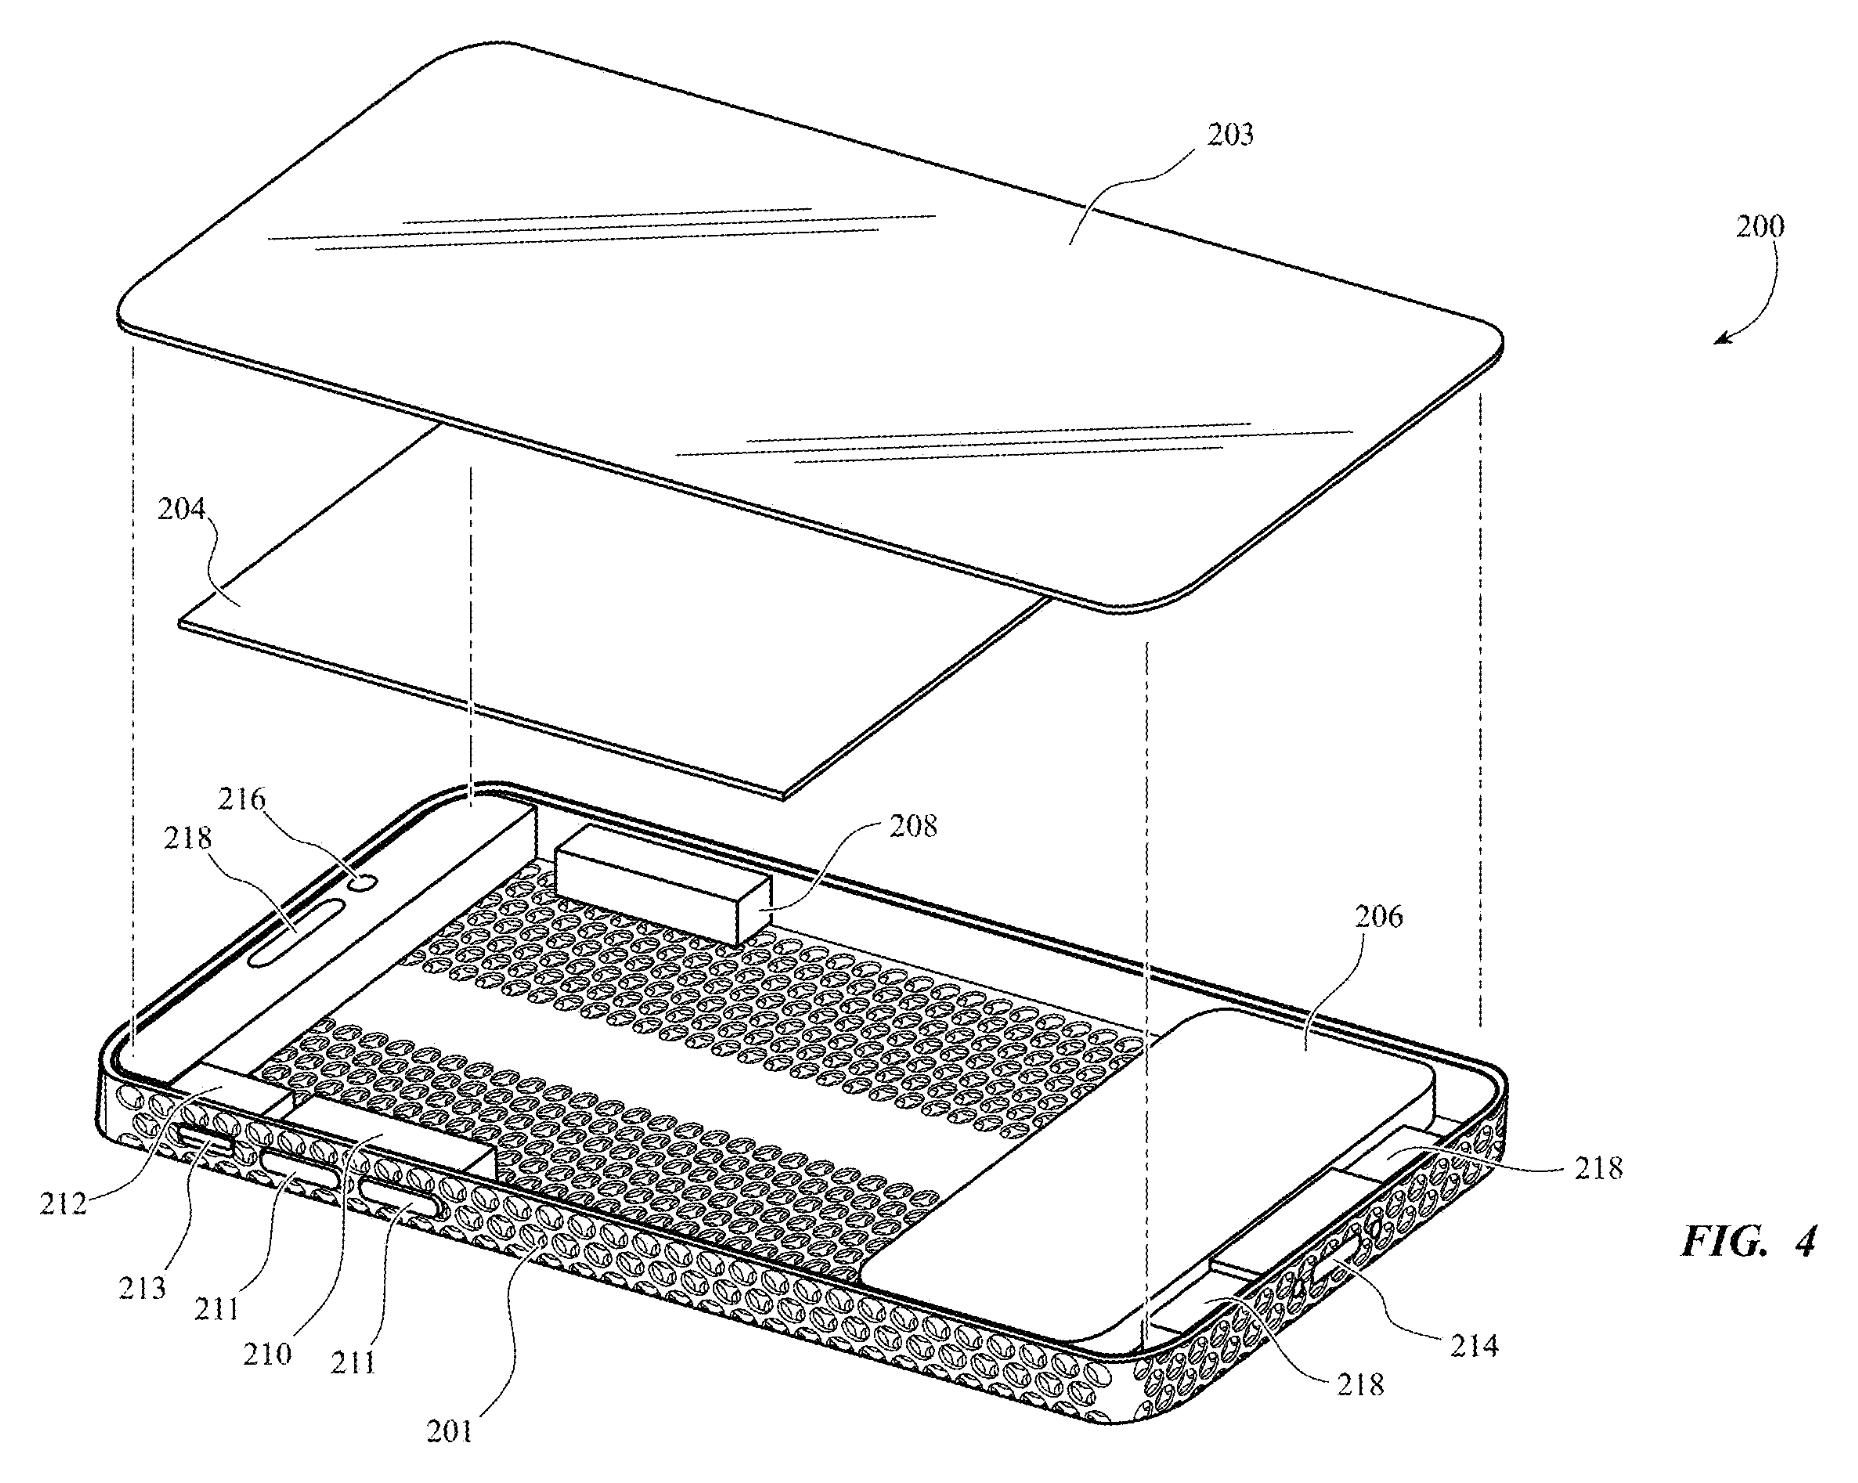 Patente com estrutura tridimensional da Apple